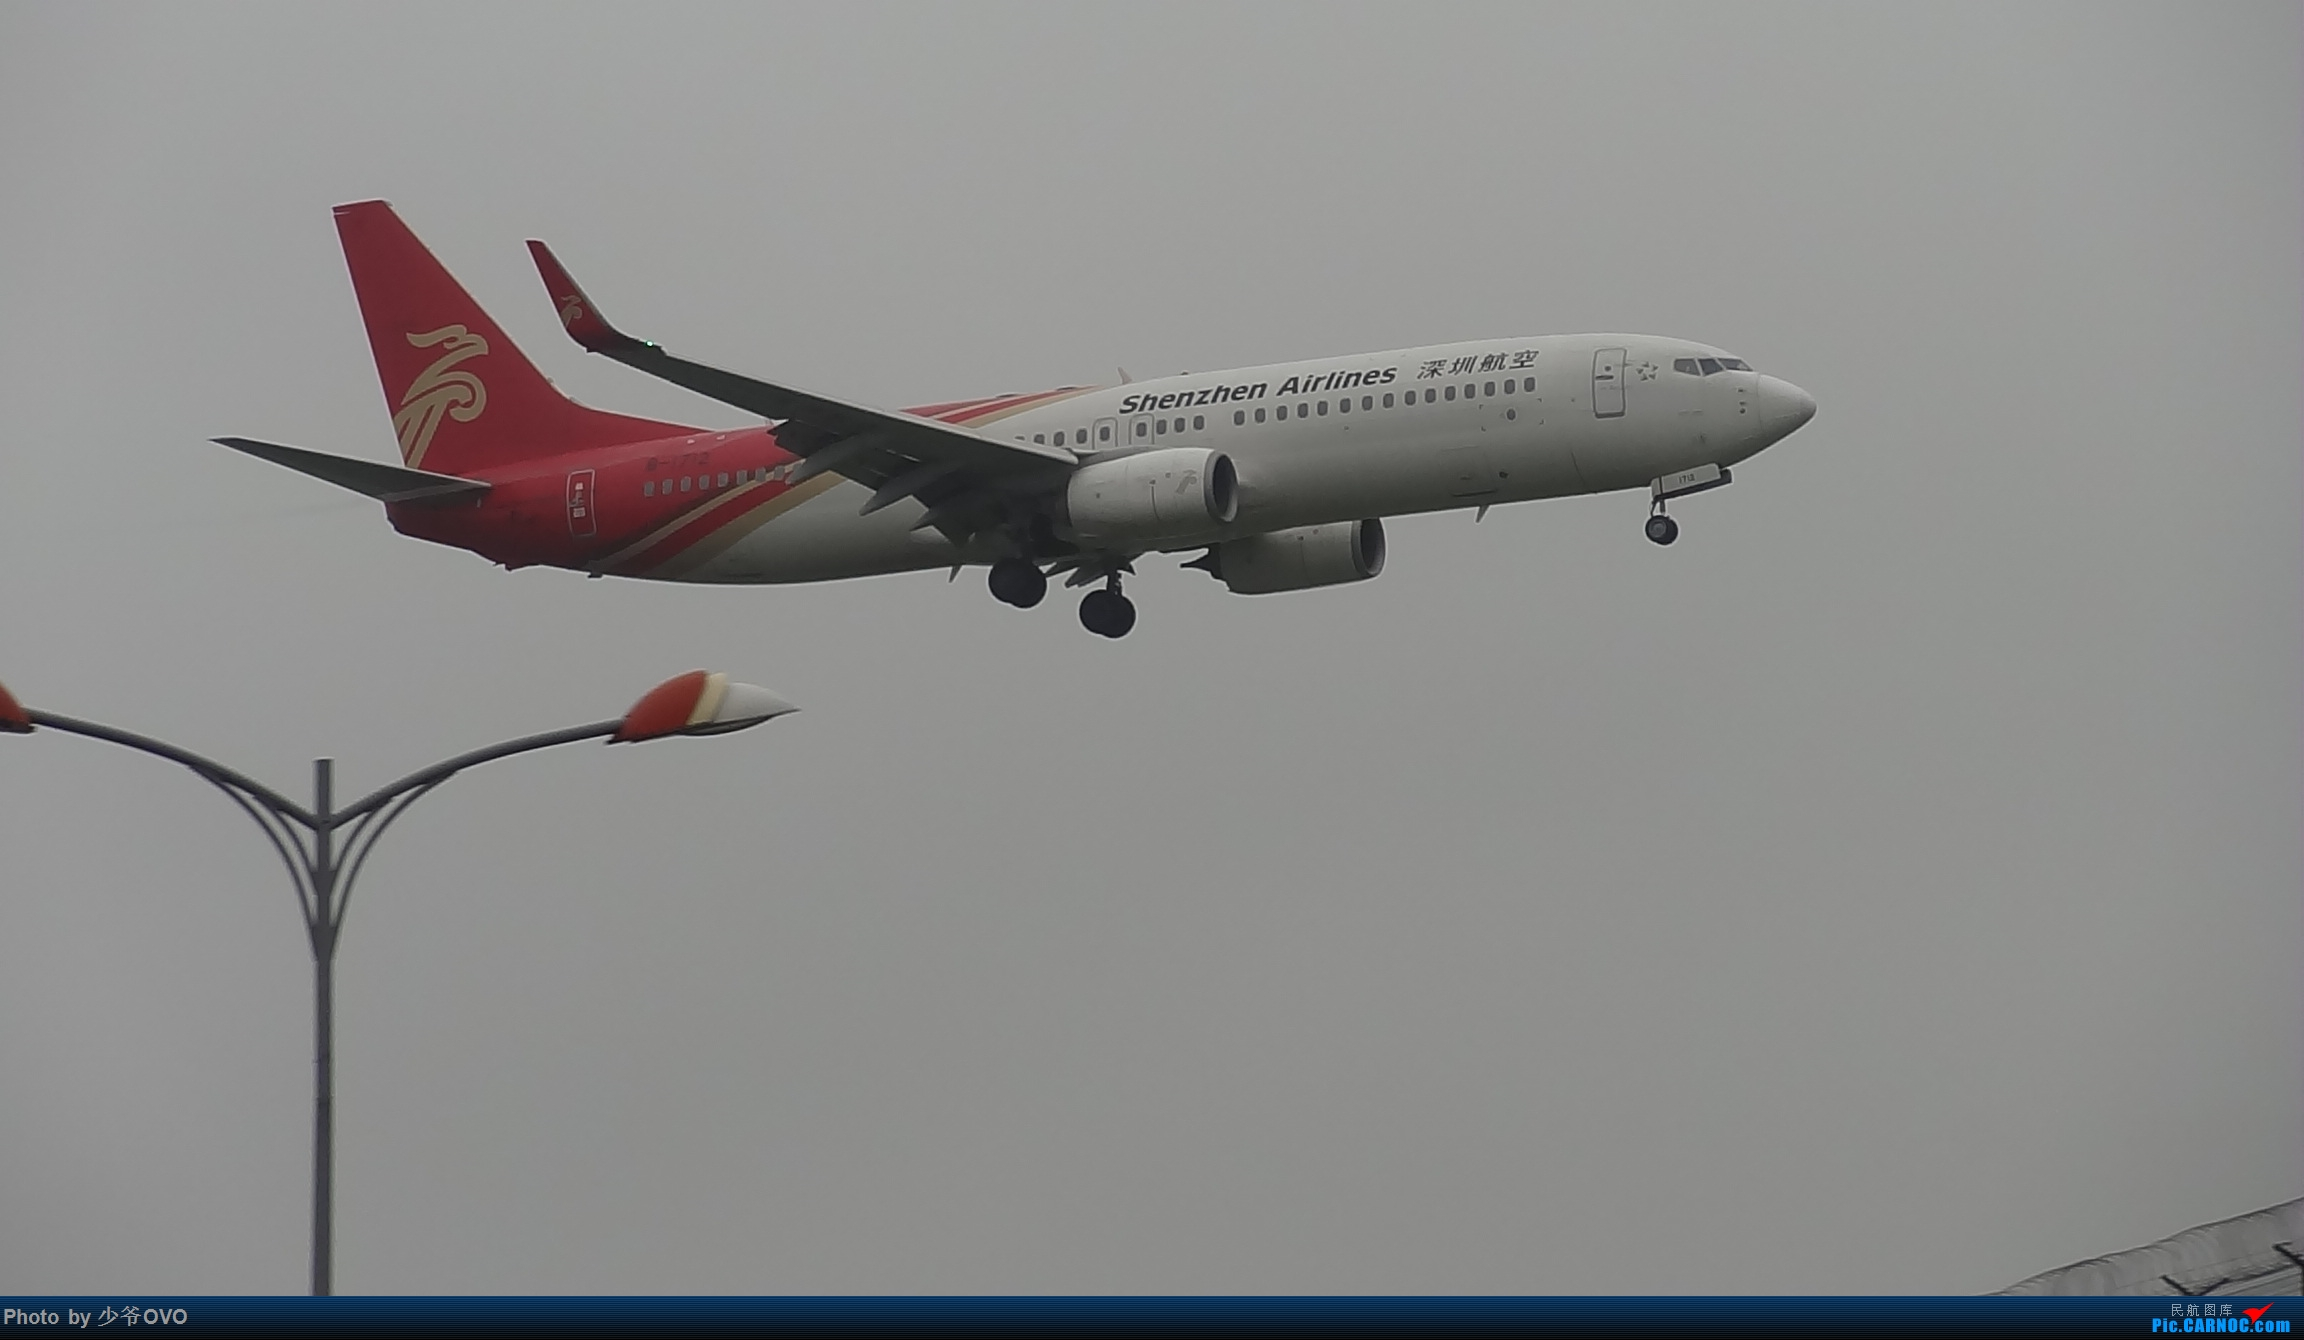 Re:[原创]CKG重庆江北机场拍机 ,渣图一堆,多指点 BOEING 737-800 B-1712 中国重庆江北国际机场